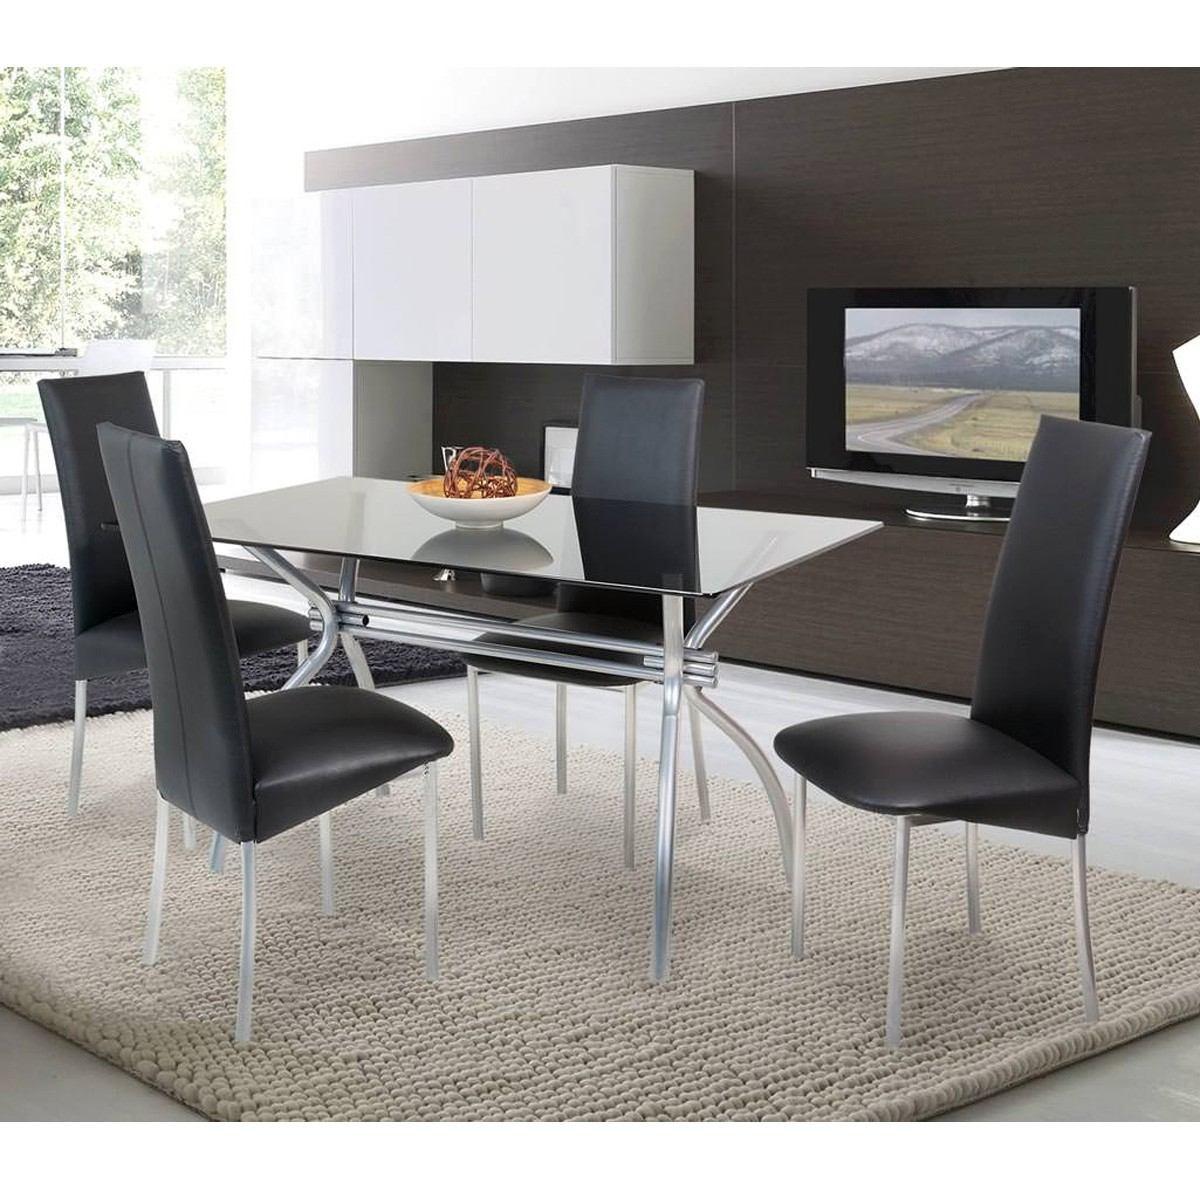 Mesa Comedor De Vidrio 1.60x0.80 + 6 Sillas Tap Ecocuero - $ 15.000 ...